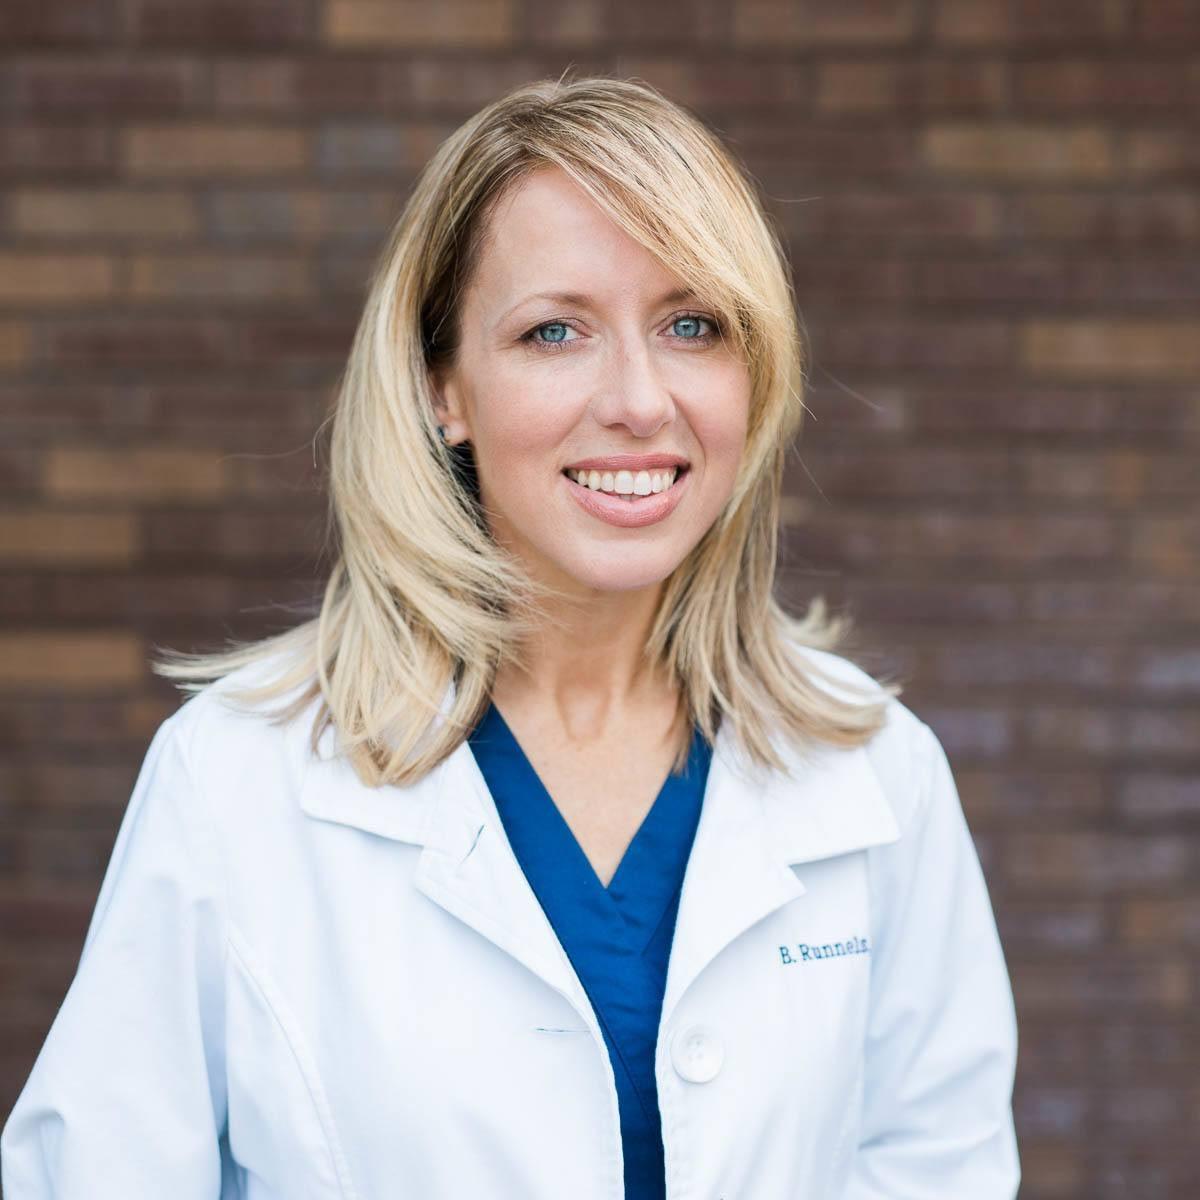 Bobbie Runnels ARNP - Dr. Raymond J. Marquette M.D. Obstetrics and Gynecology Ocala Florida Provider